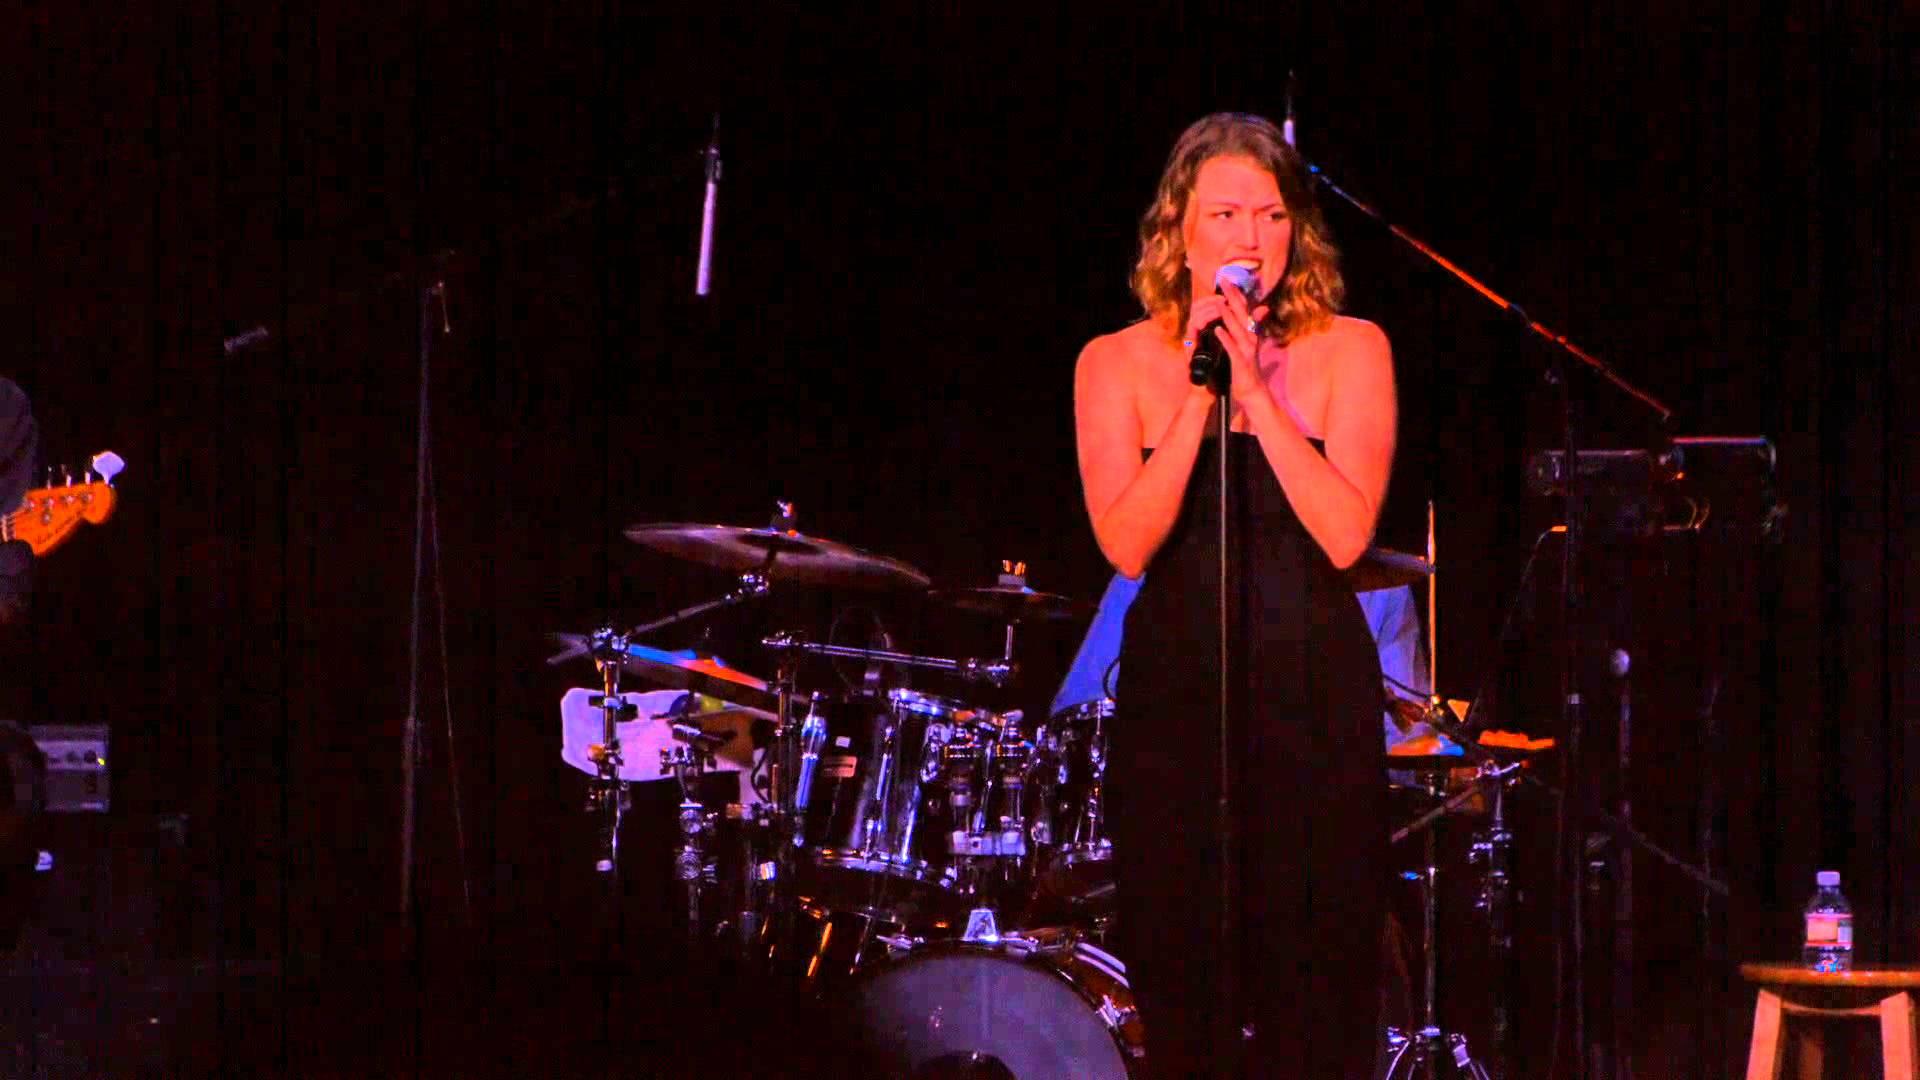 #Bermuda Festival 2015 – Rebecca Faulkenberry Medley @beccafaulken